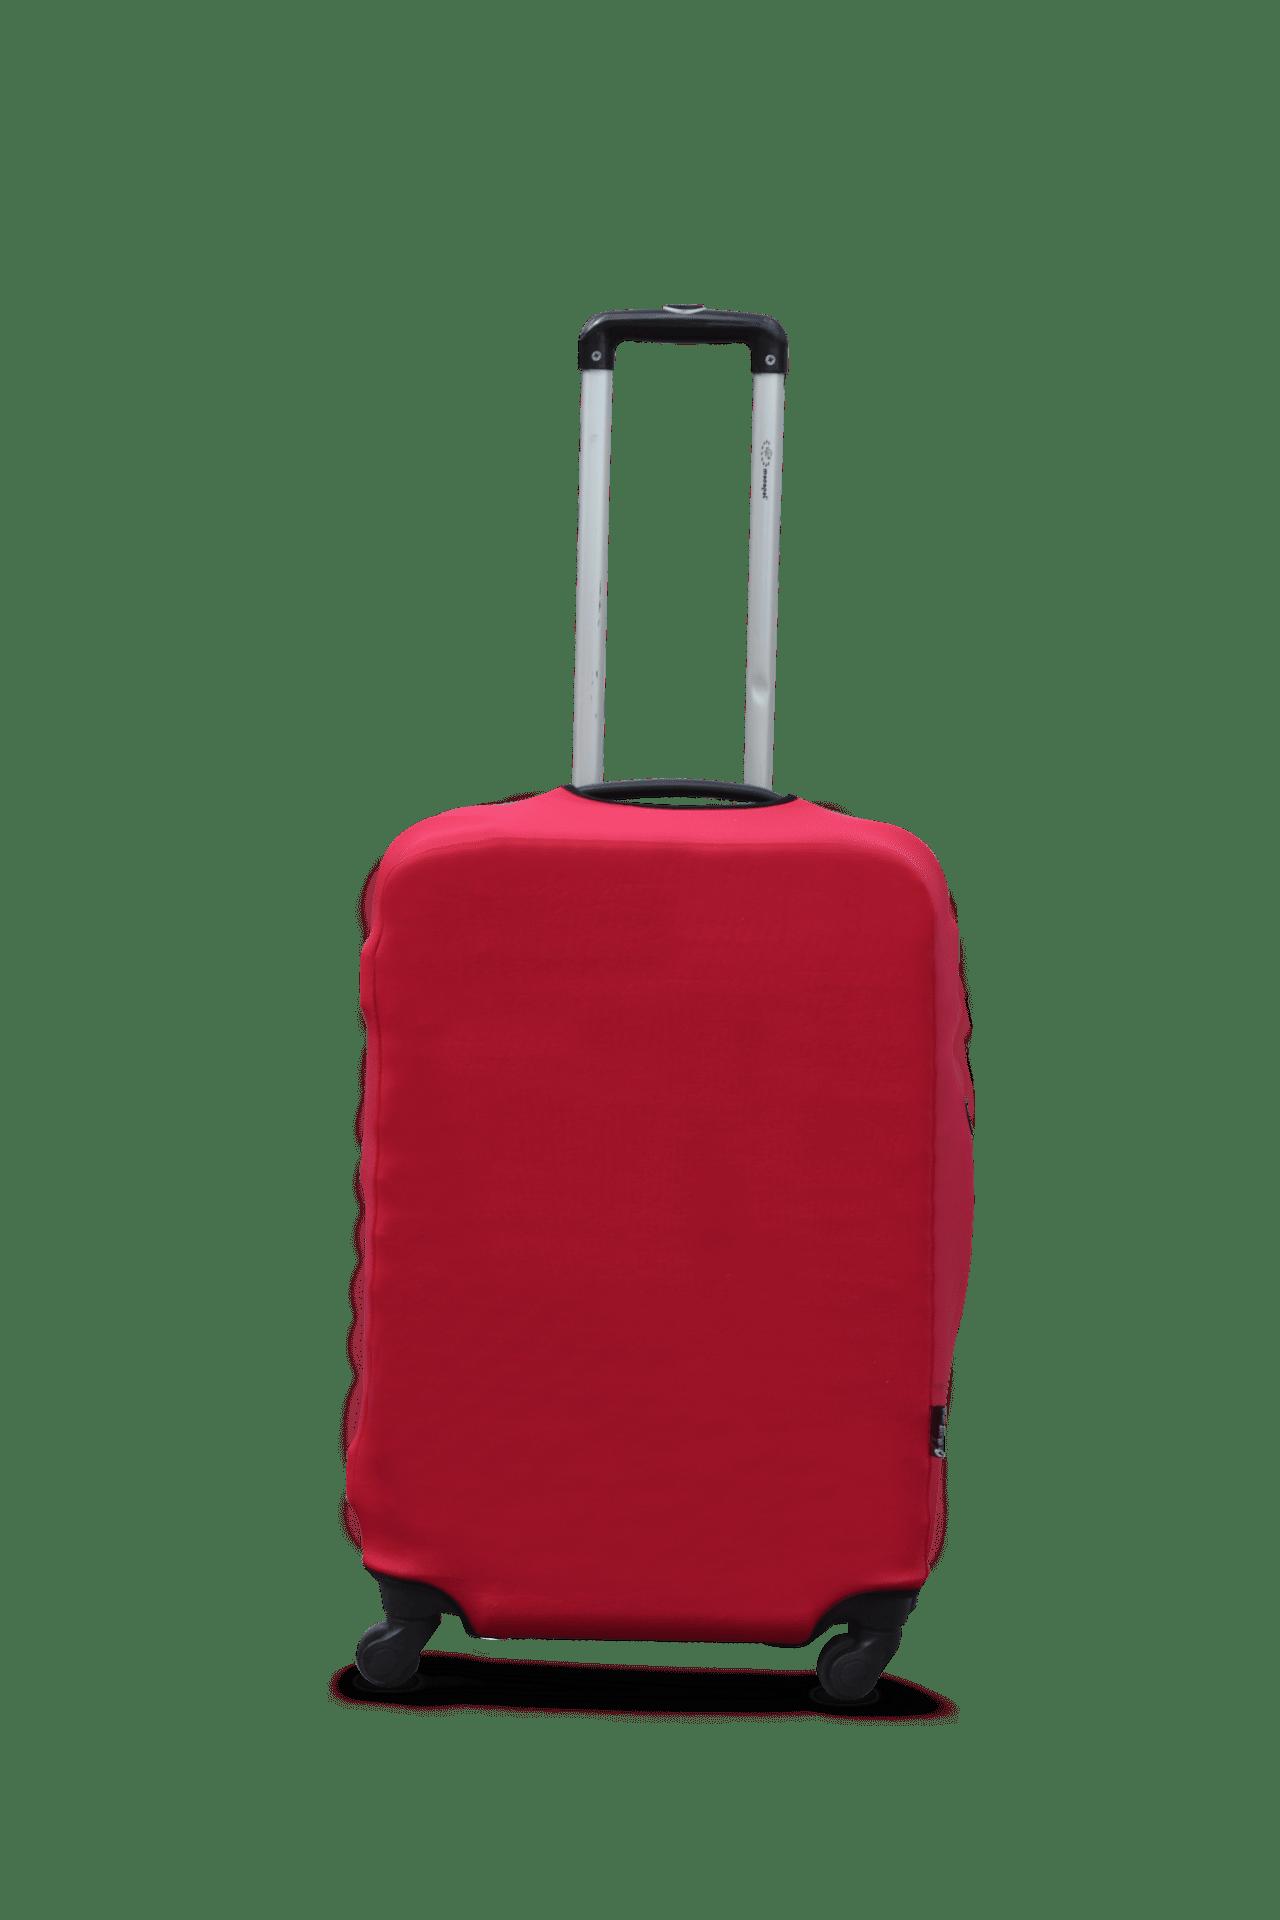 Husa pentru valiza daiving Cover DAWING S RED